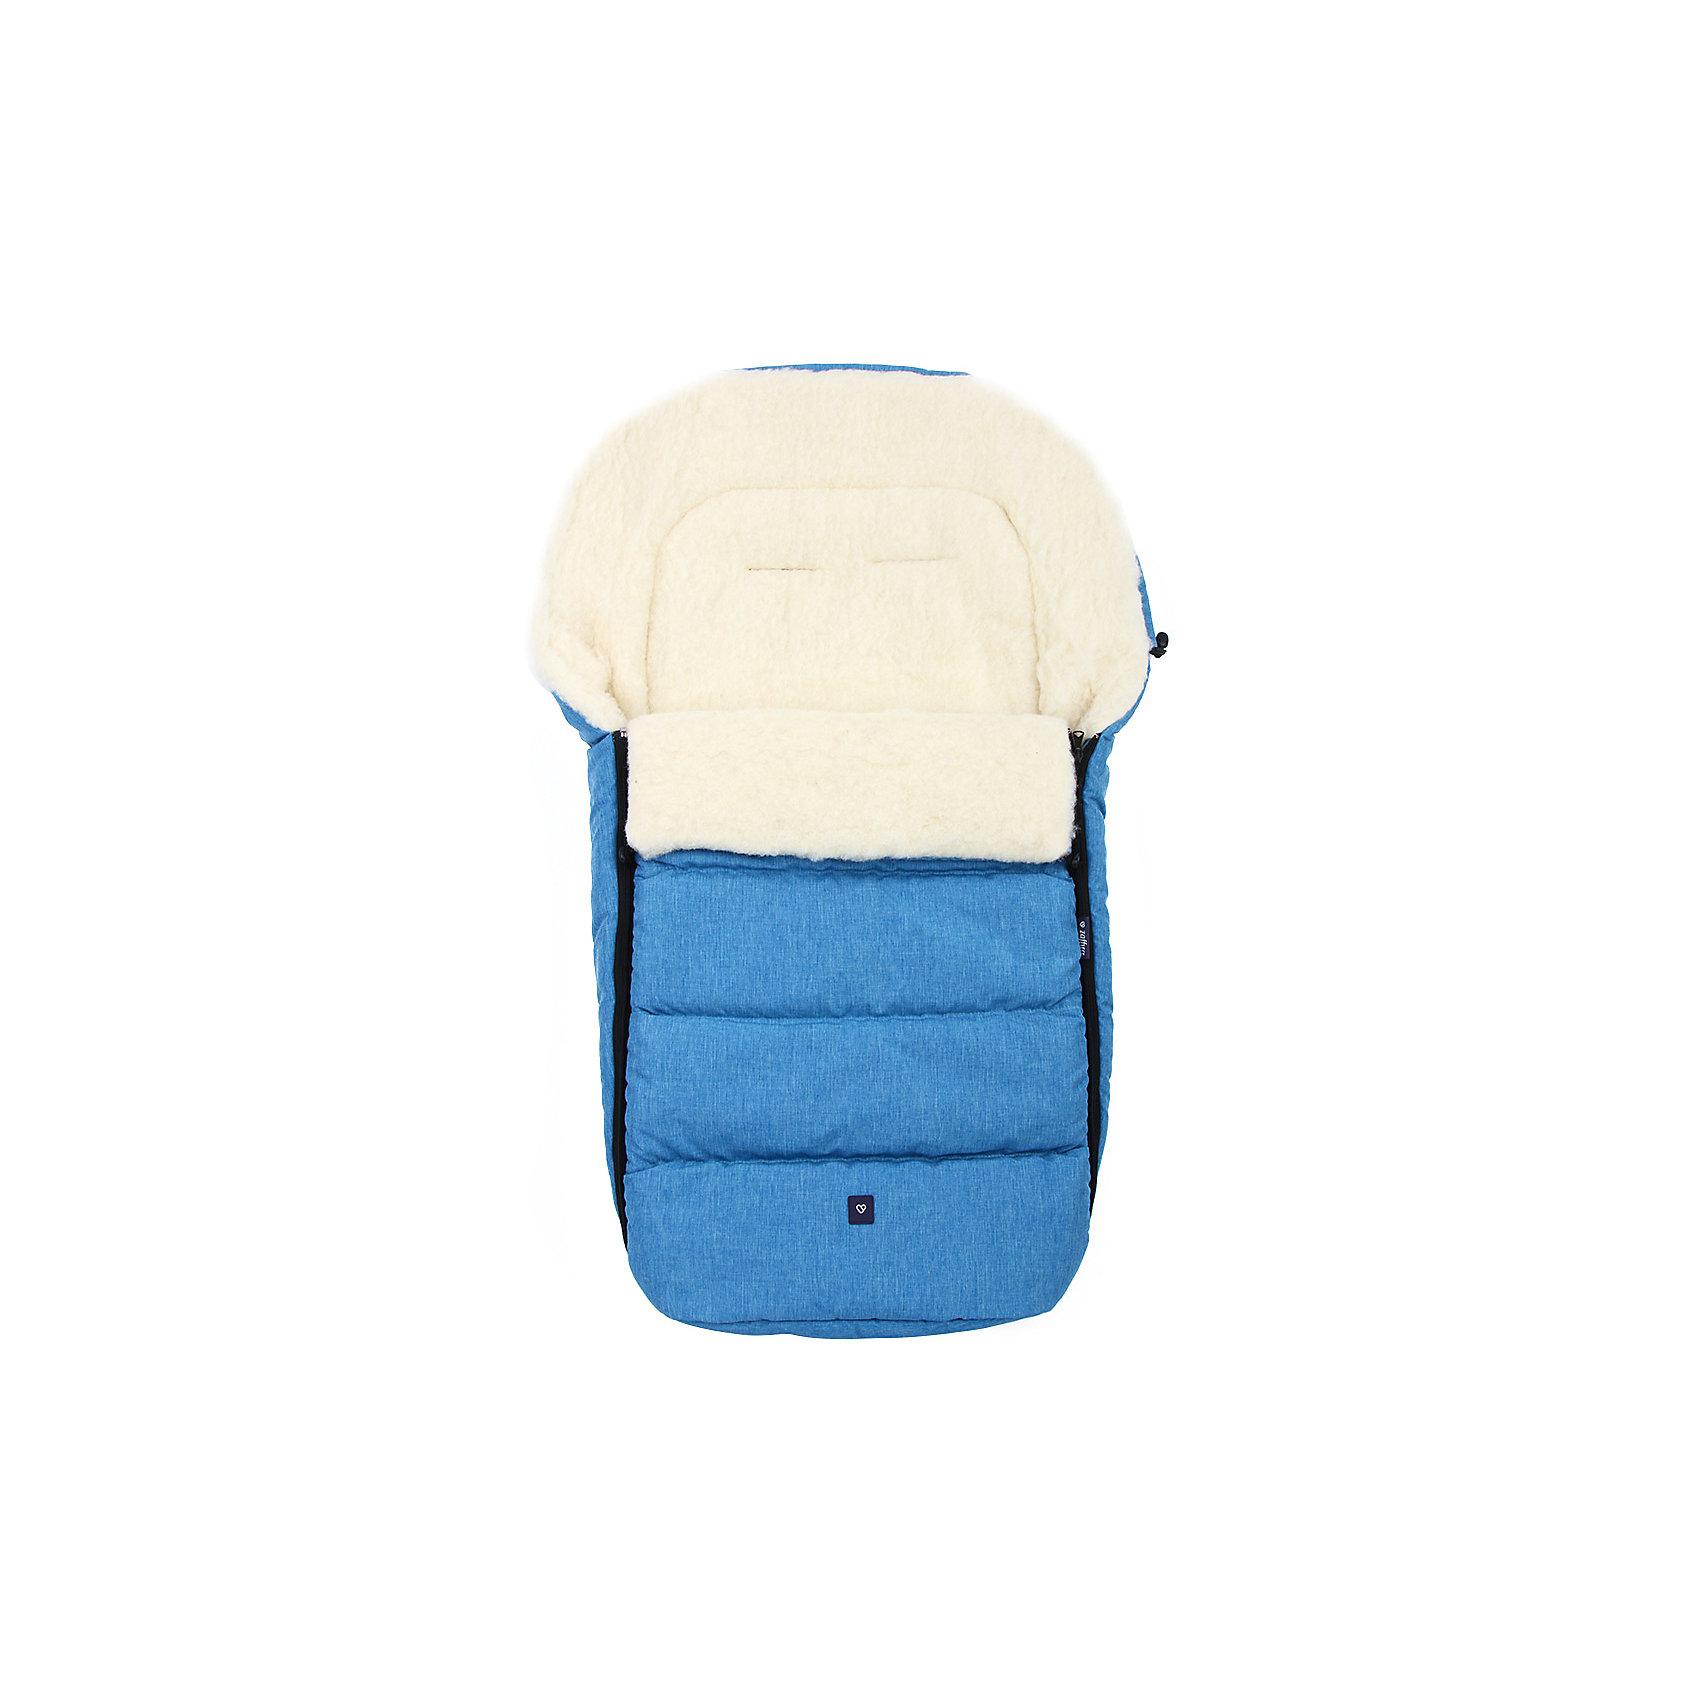 Конверт зимний №S77 Exclusive, 95*50, шерсть, Womar, синий